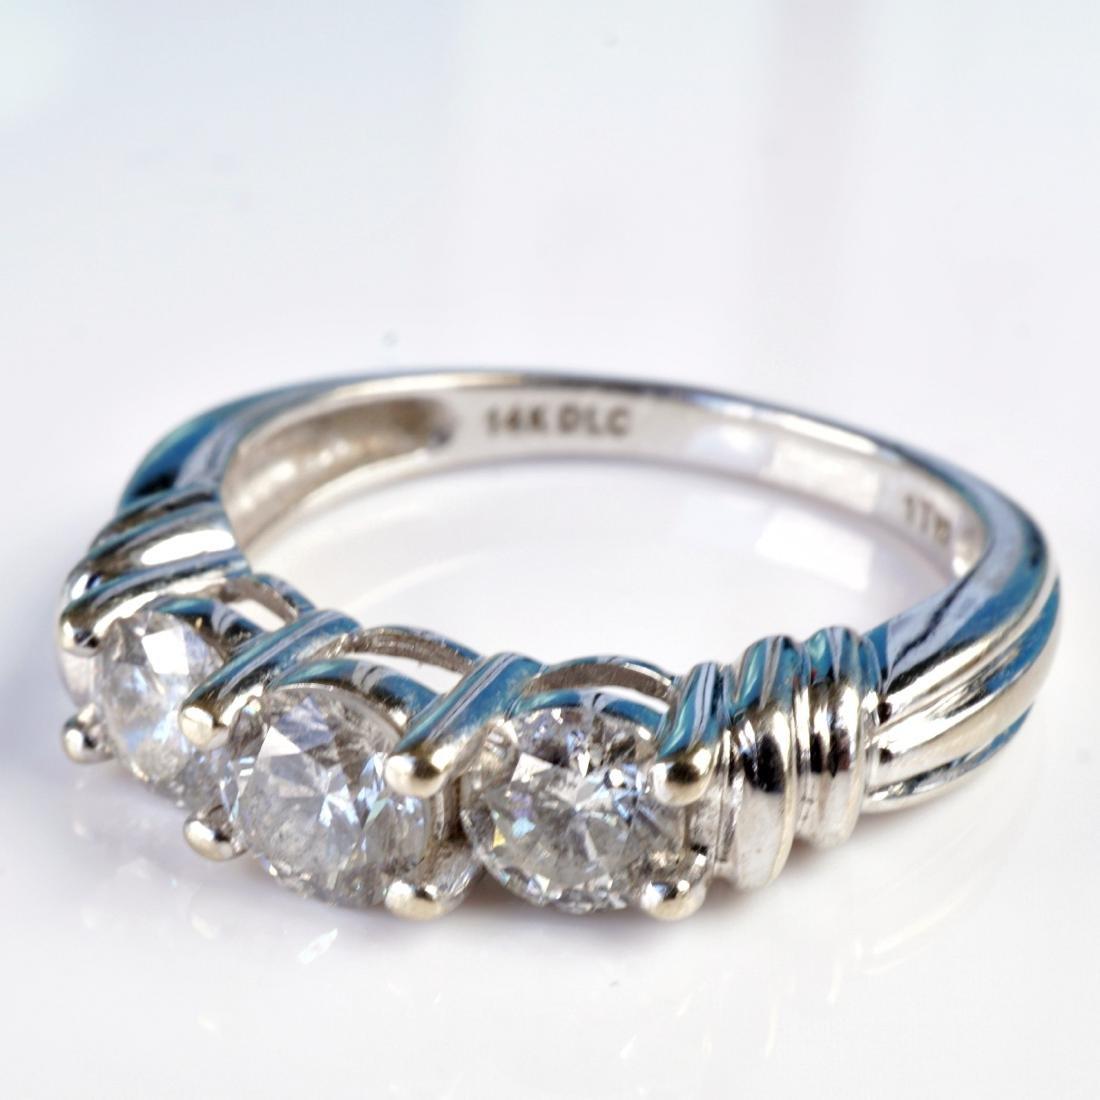 14k WG 1 CT Diamond Ring sz 6.75 - 4